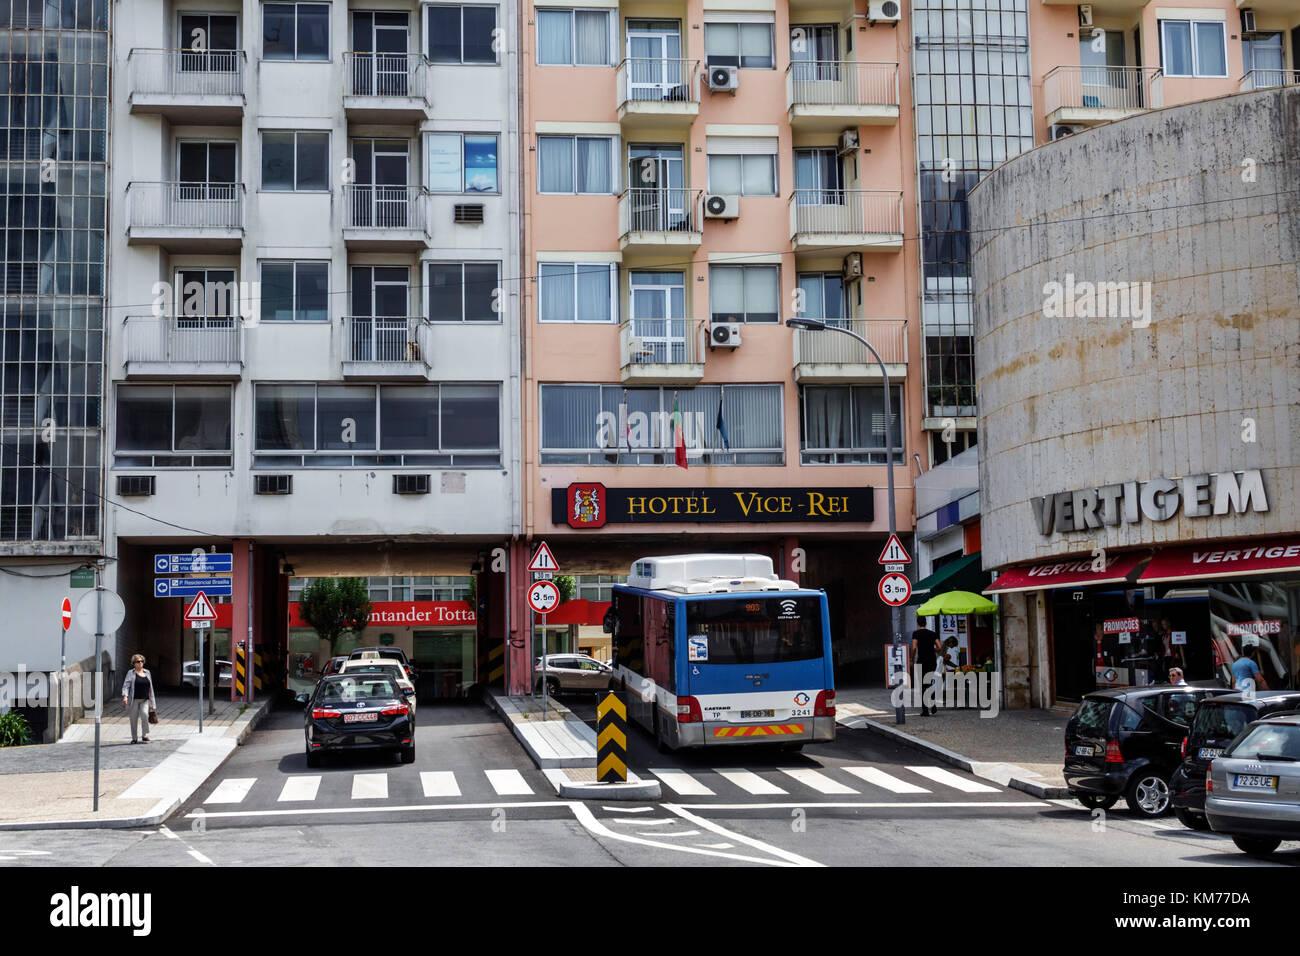 Porto Portugal Boavista Largo de Ferreira Lapa building underpass tunnel traffic bus car Hotel VIce-Rei residential - Stock Image